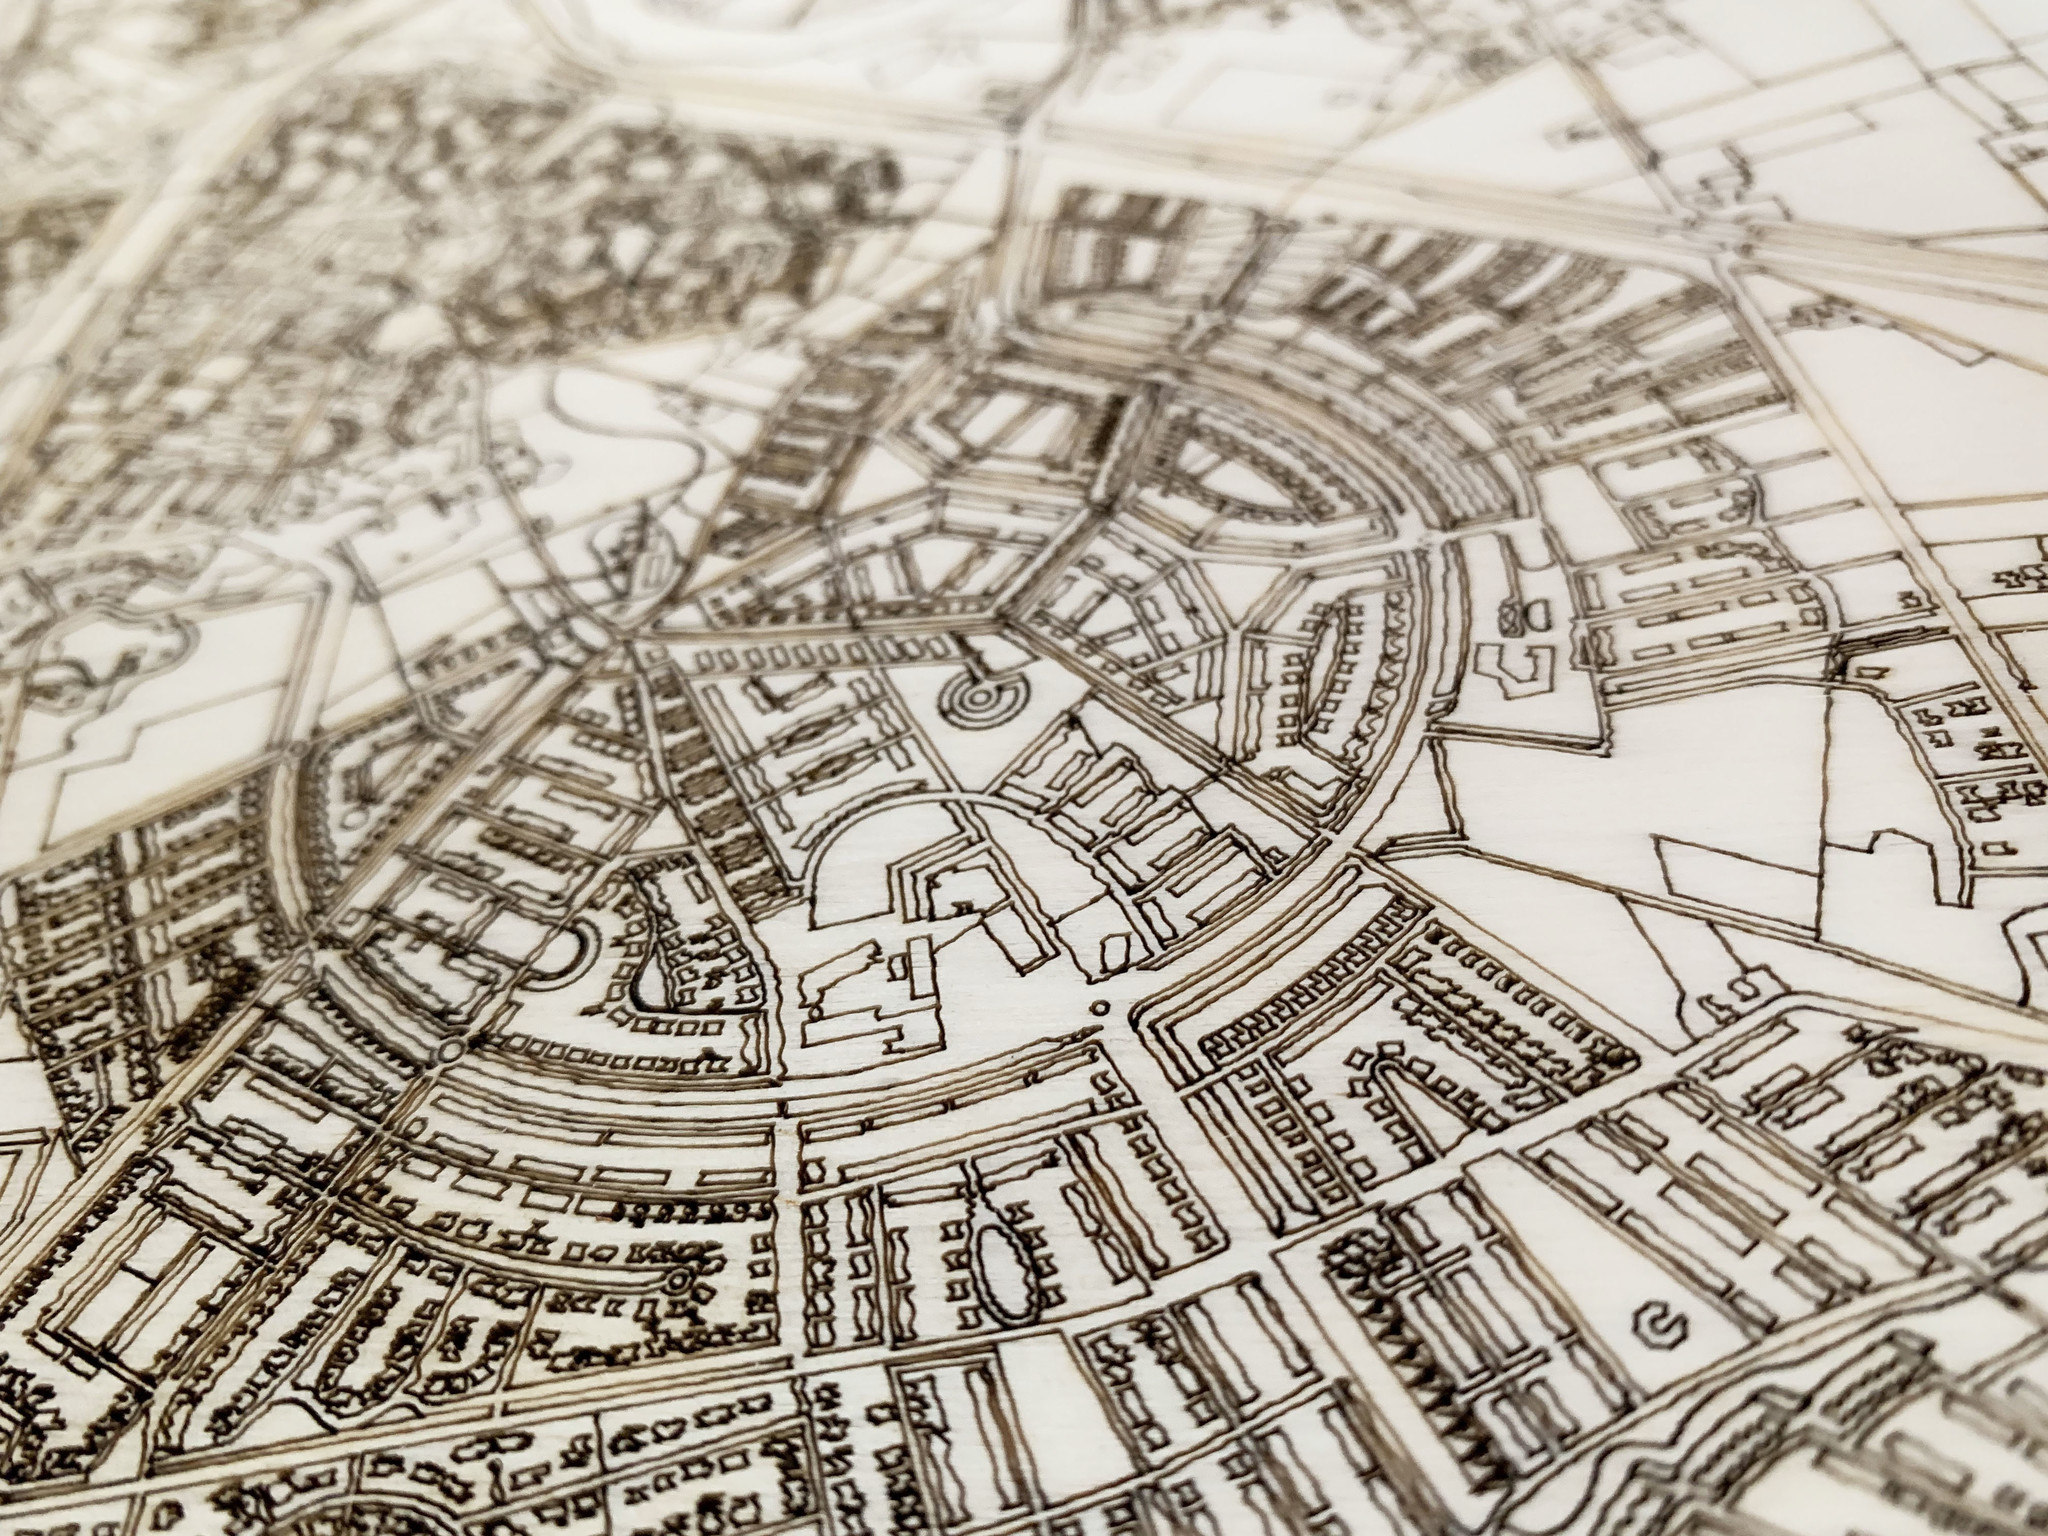 Houten stadsplattegrond Krakau-4